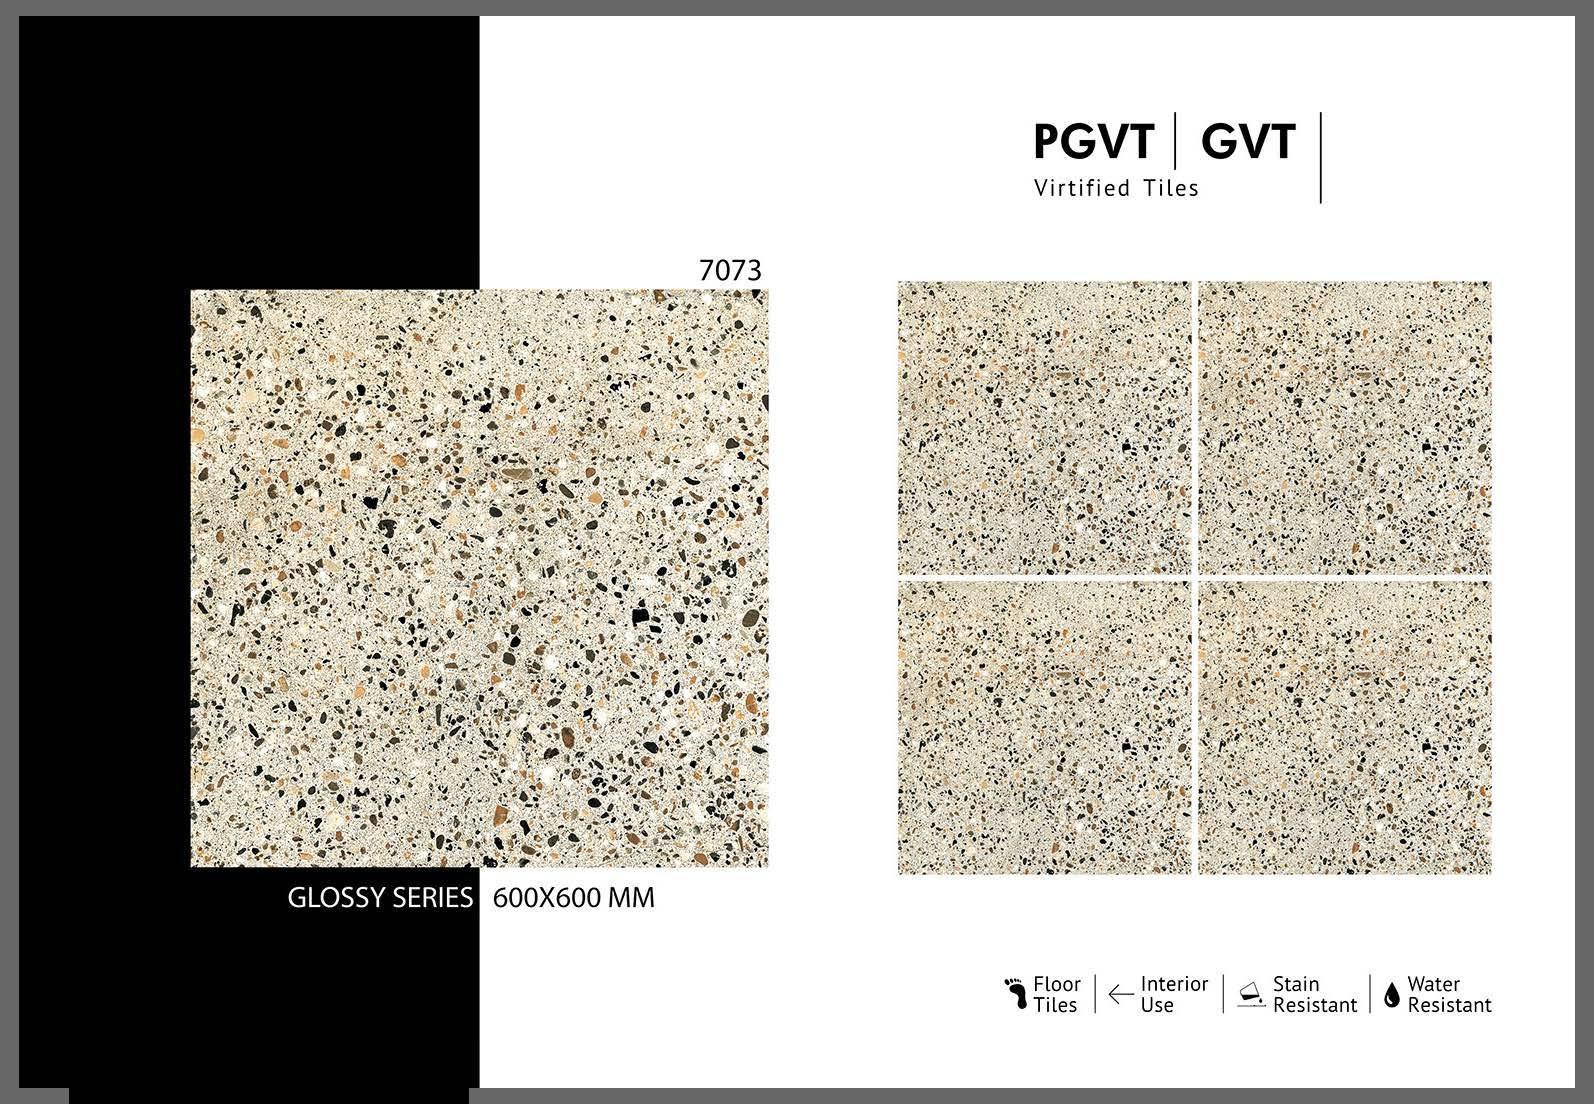 GVT 2X2 GLOSSY_Page_60.jpg